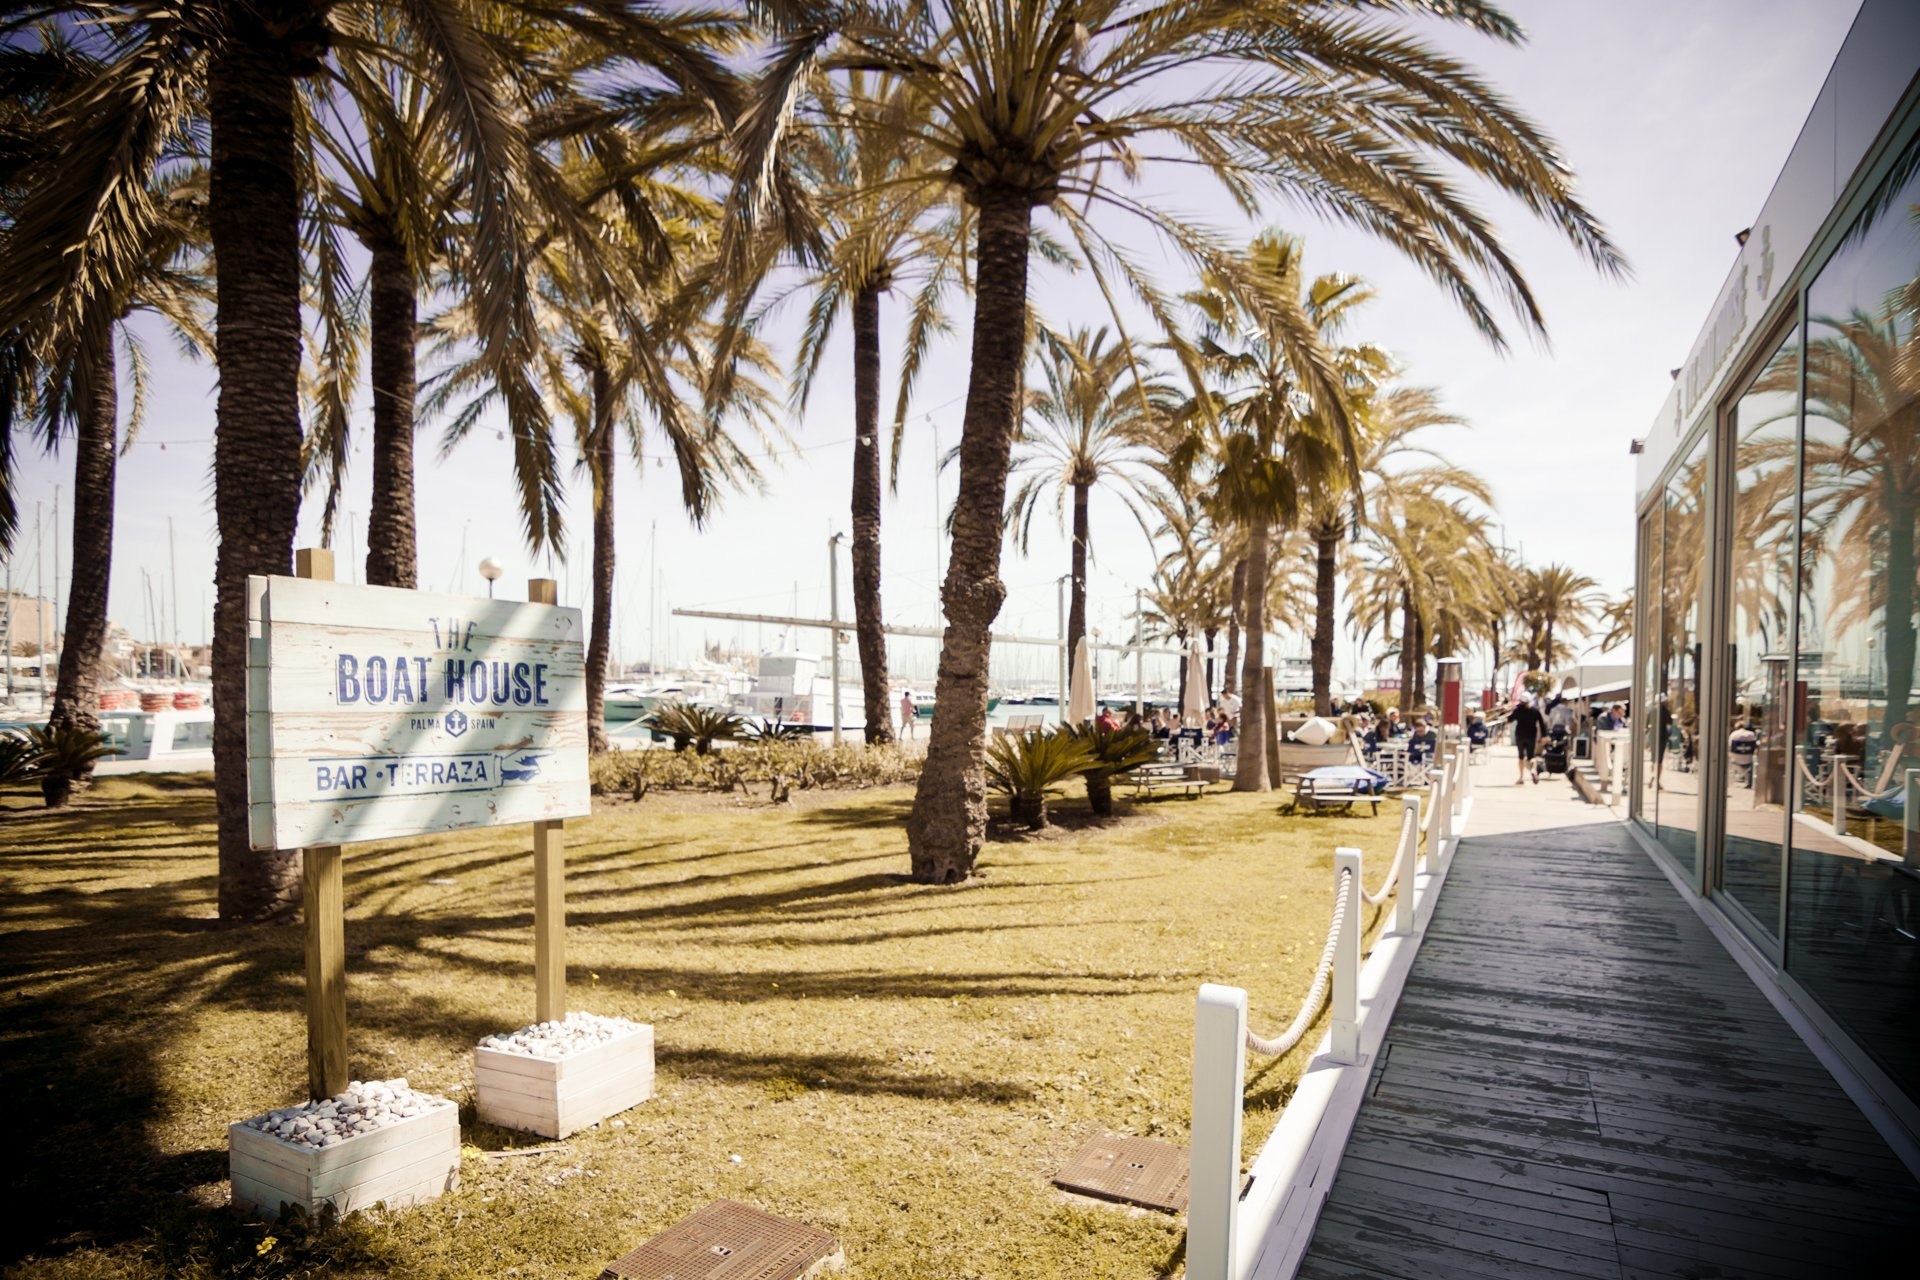 The Boat House Palma